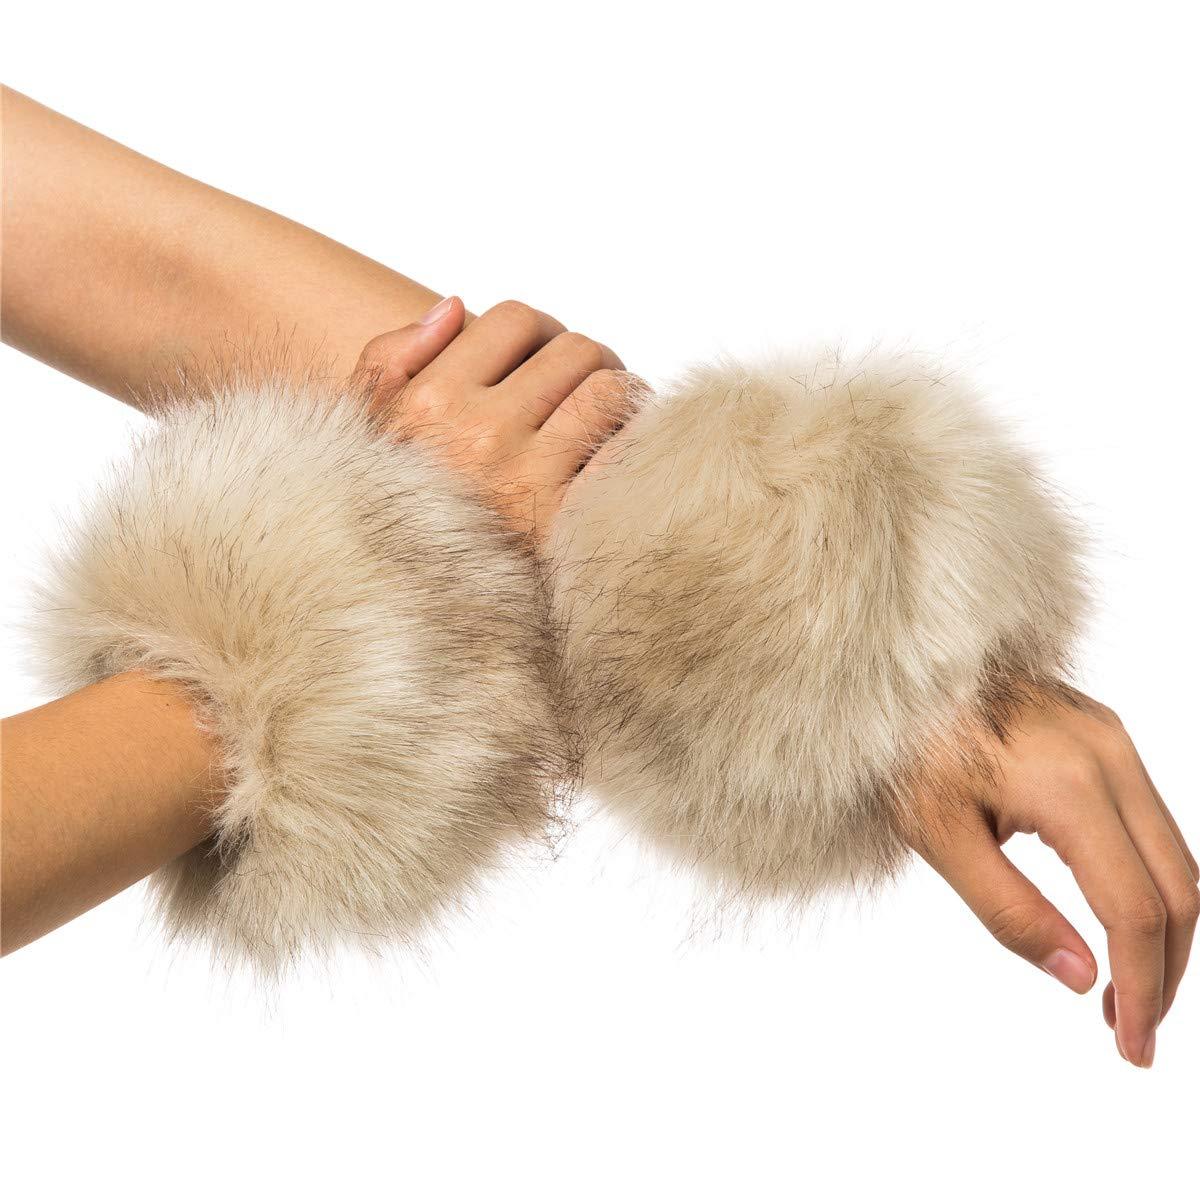 Lucky Leaf Women Winter Wrist Warmers Faux Fur Soft Cuffs Band Ring (C1-Beige)